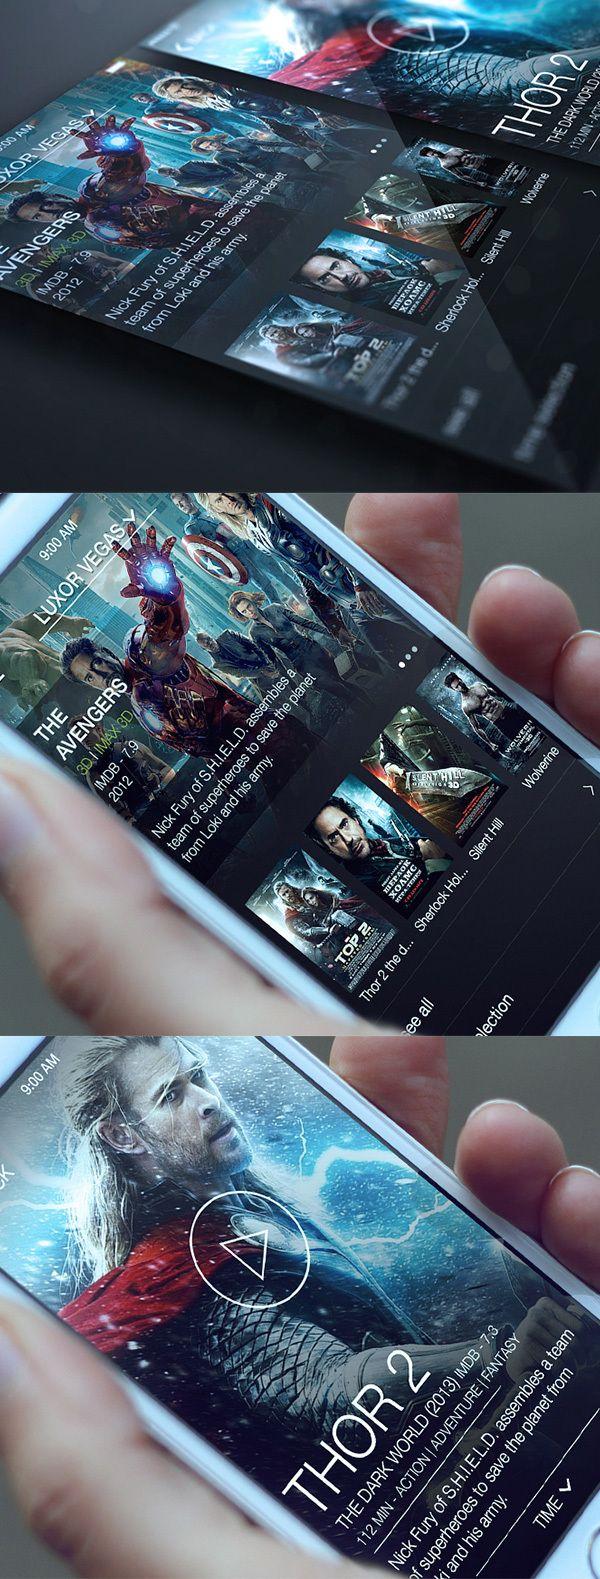 Cinema App by Alex Bender, via Behance